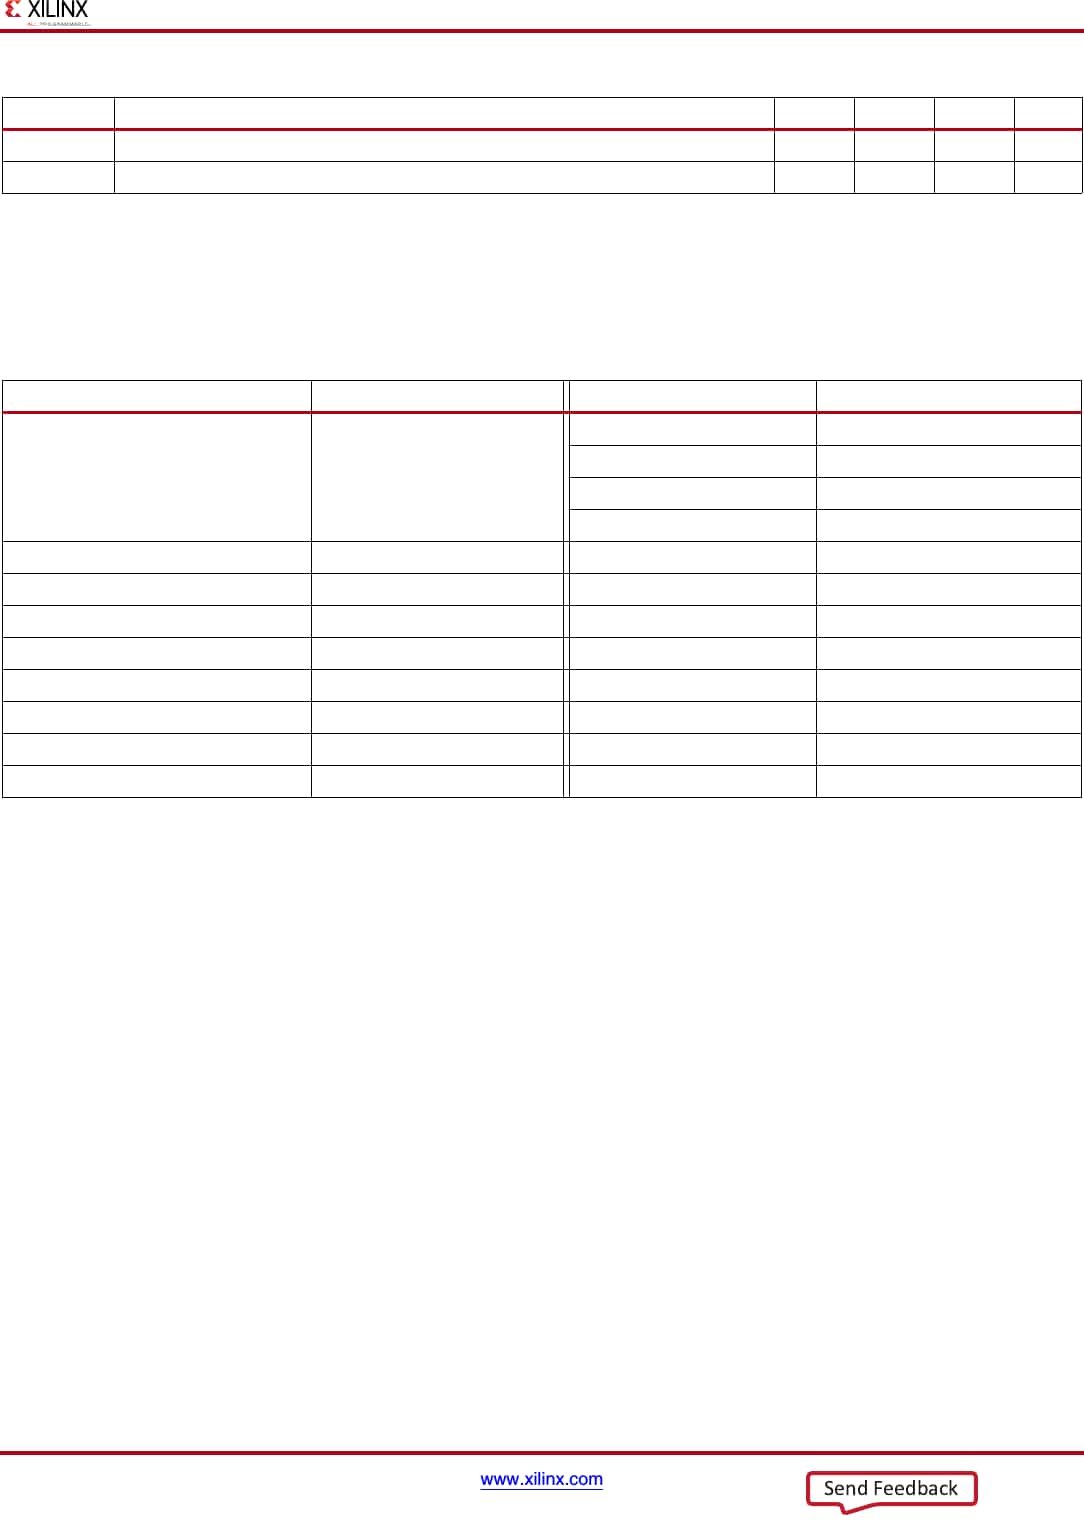 hight resolution of artix 7 fpgas data sheet dc and ac switching characteristics